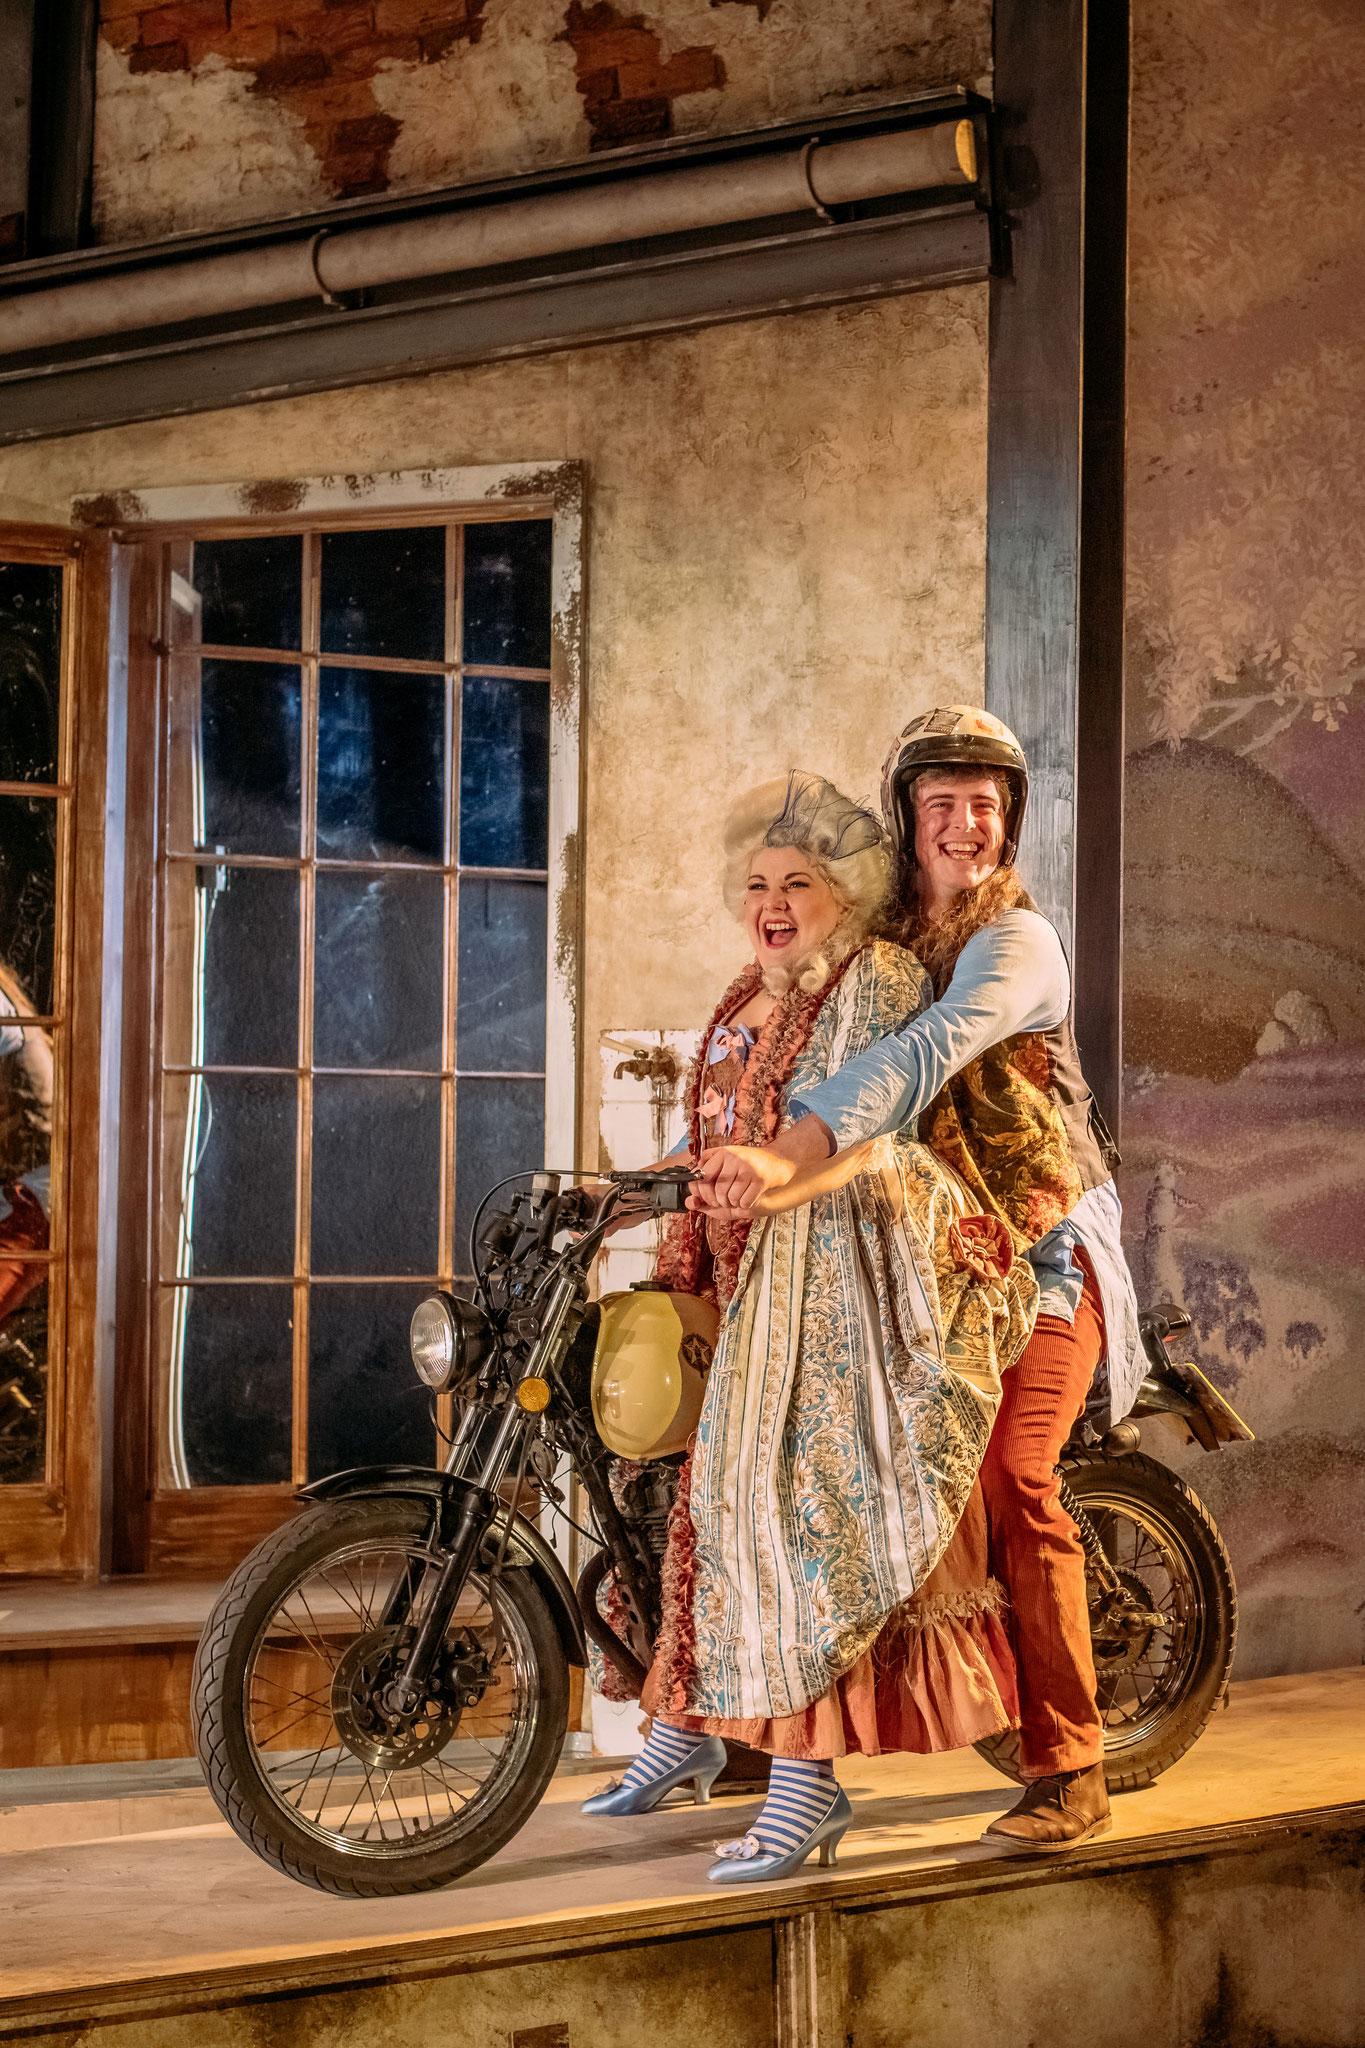 Amaranta & Perrucchetto (Andrew Hamilton), La fedeltà premiata: Guildhall Opera November 2019 - Photo courtesy of Mihaela Bodlovic